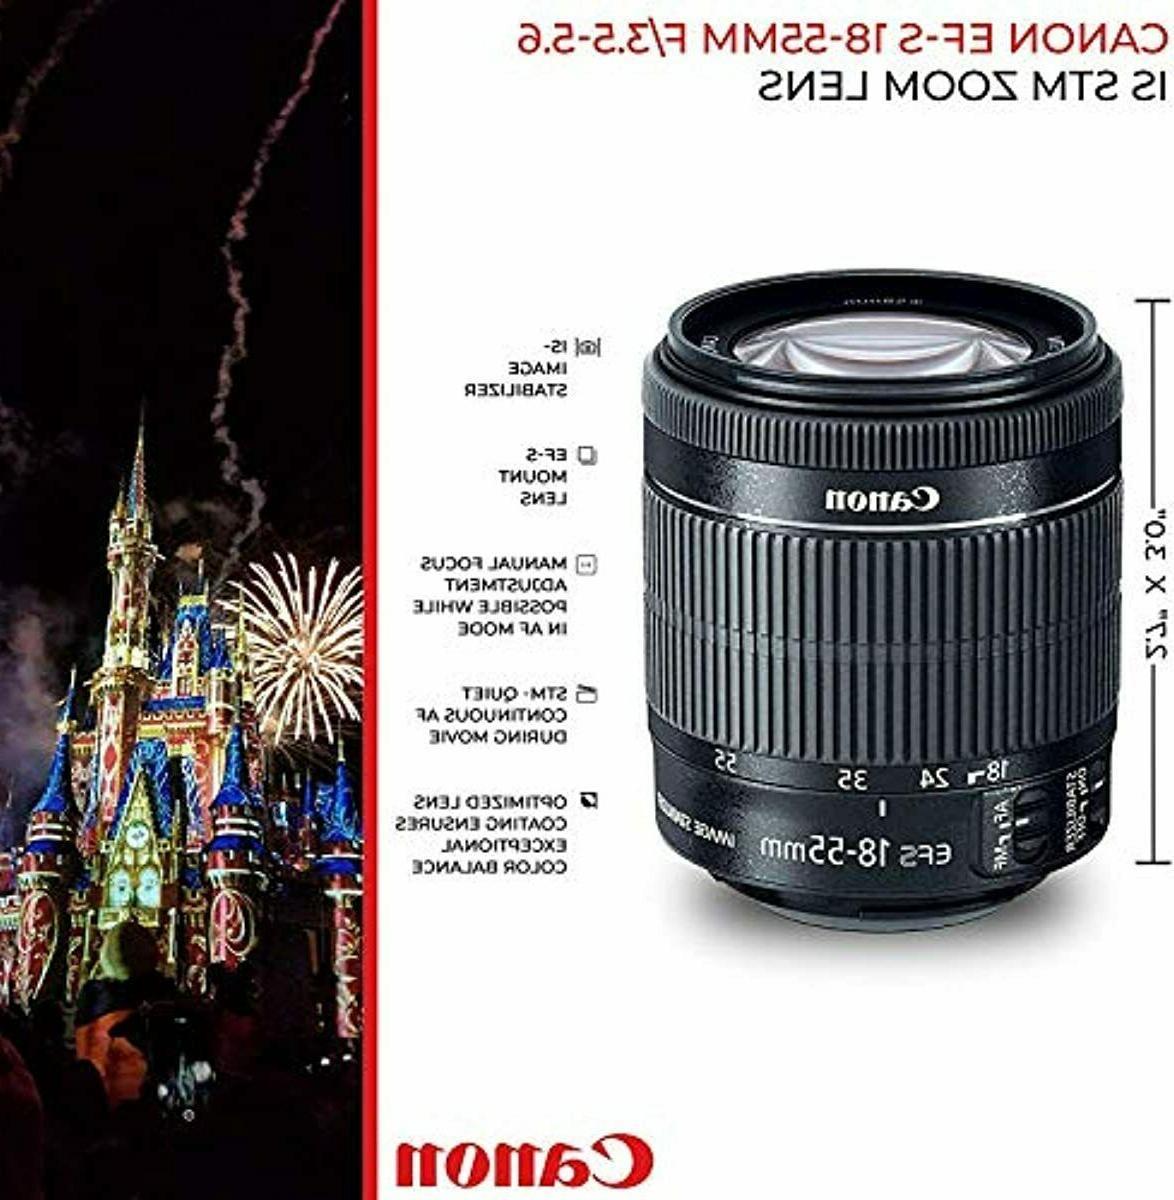 Canon Rebel T7i 24.2MP SLR + f/4-5.6 is